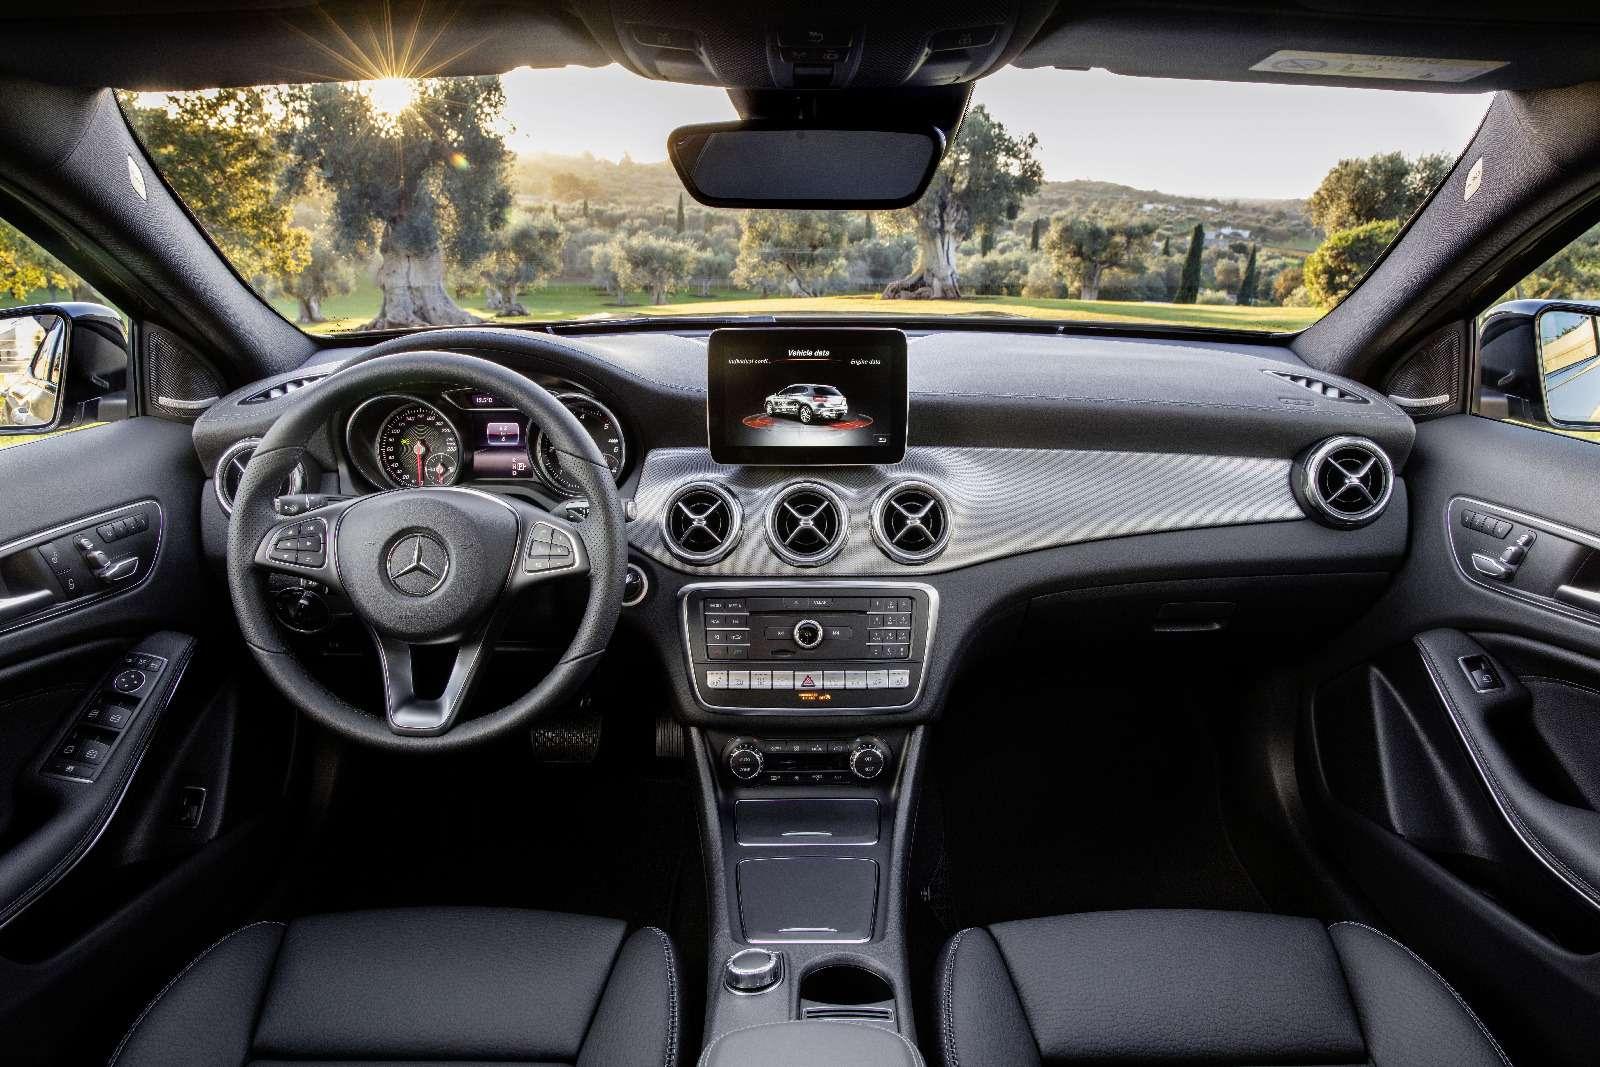 Mercedes-Benz GLA стал краше, нонепросторнее— фото 690063